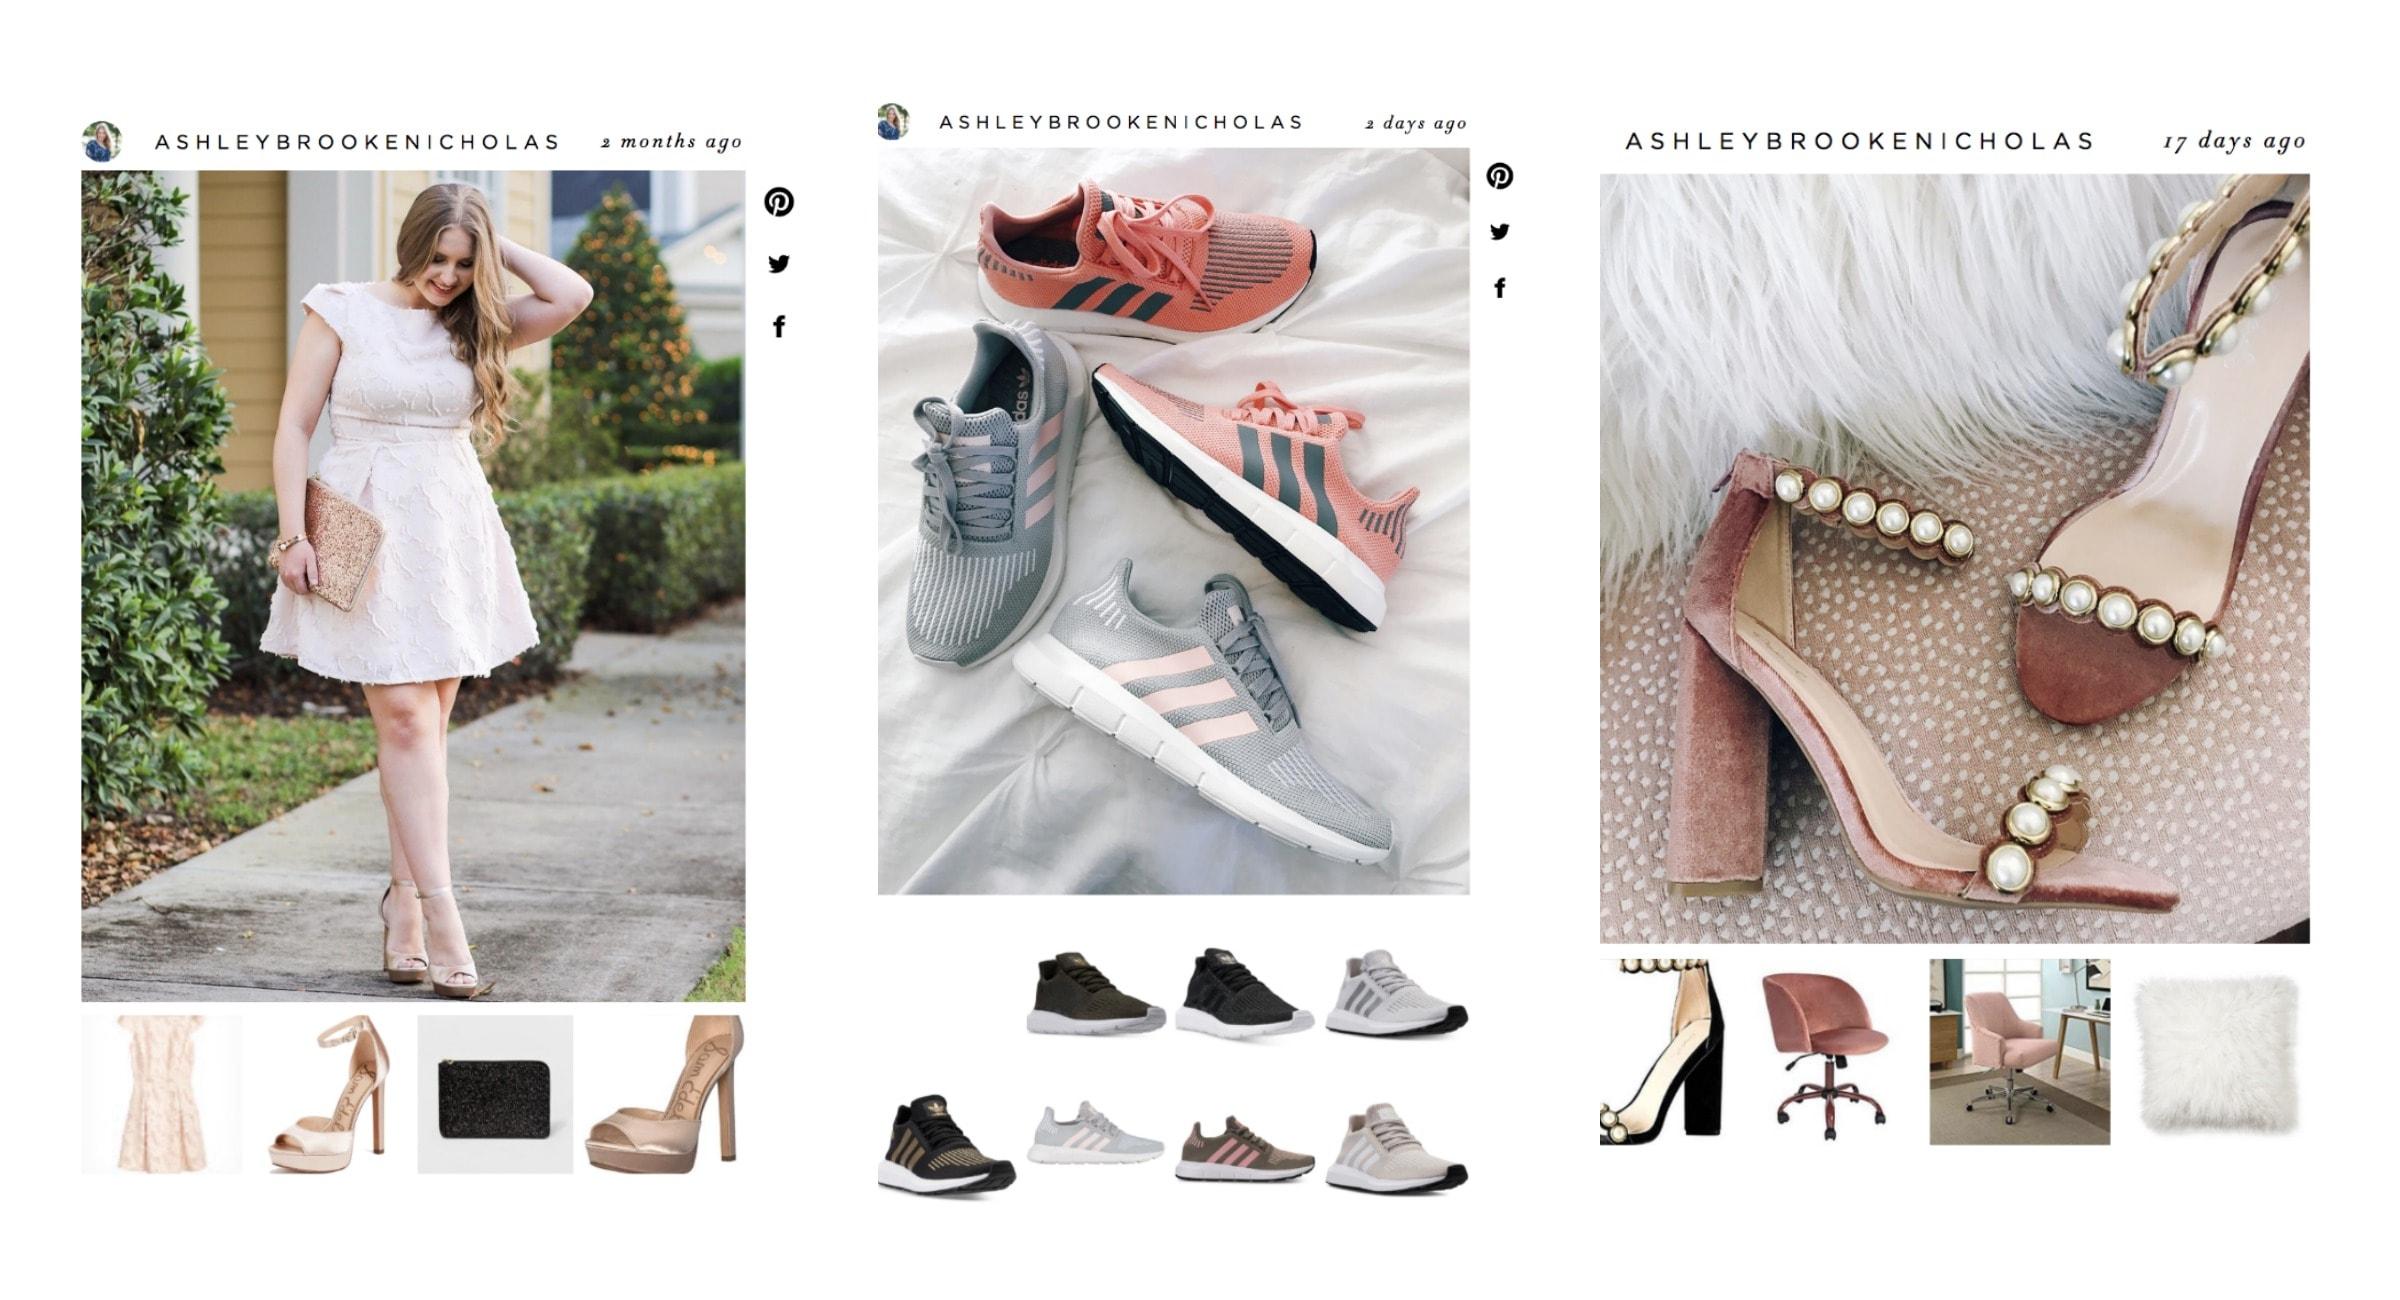 January favorites | January gift ideas | new year inspiration | Ashley Brooke Nicholas